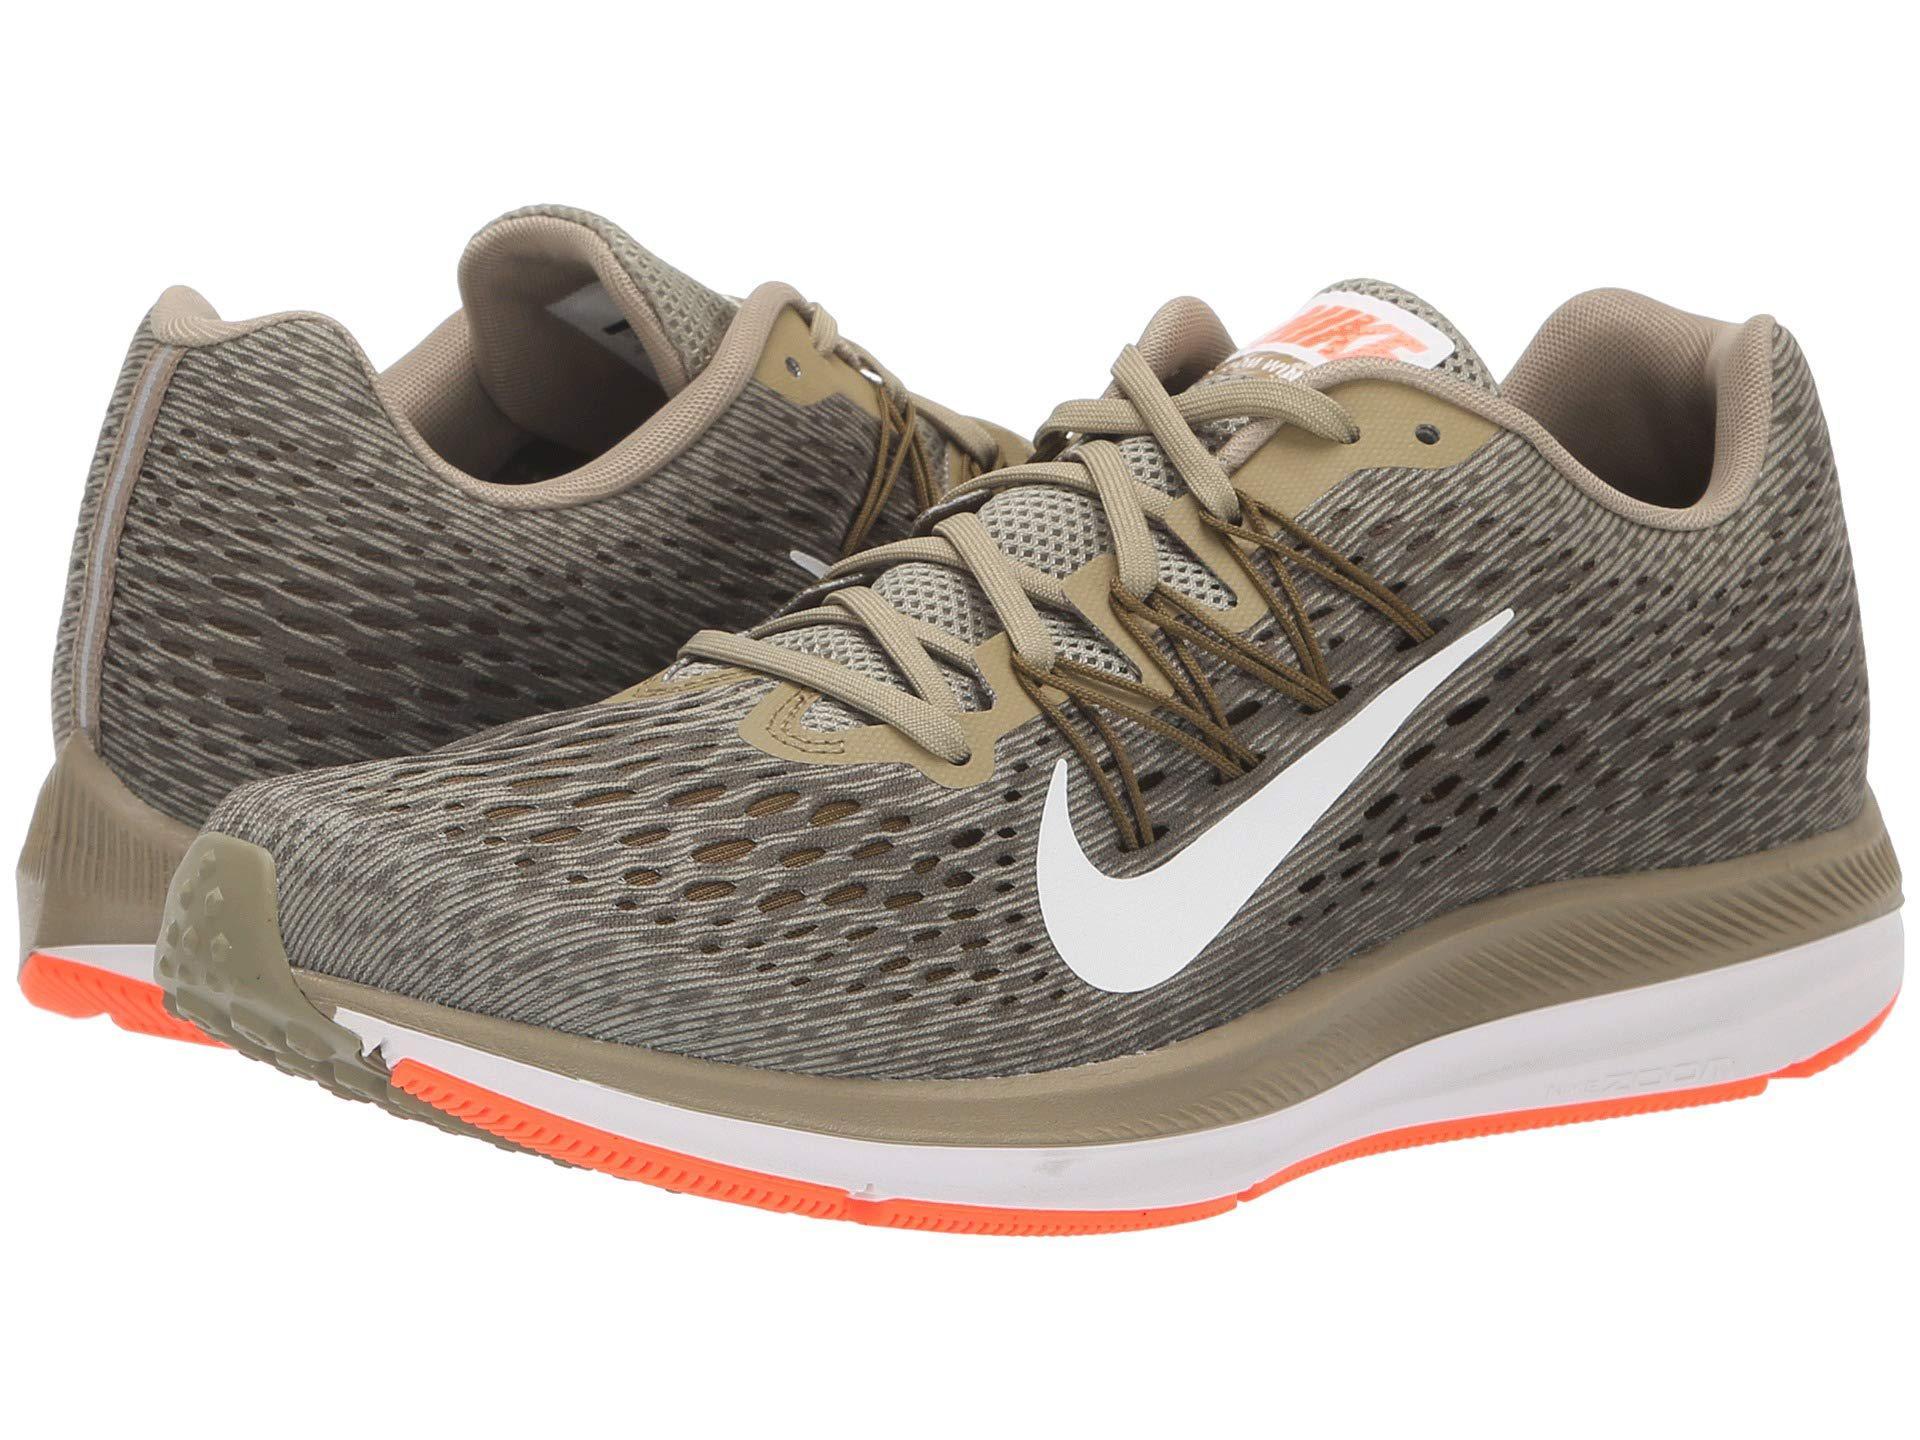 Lyst - Nike Air Zoom Winflo 5 (black white anthracite) Men s Running ... 9ec0bfa2b